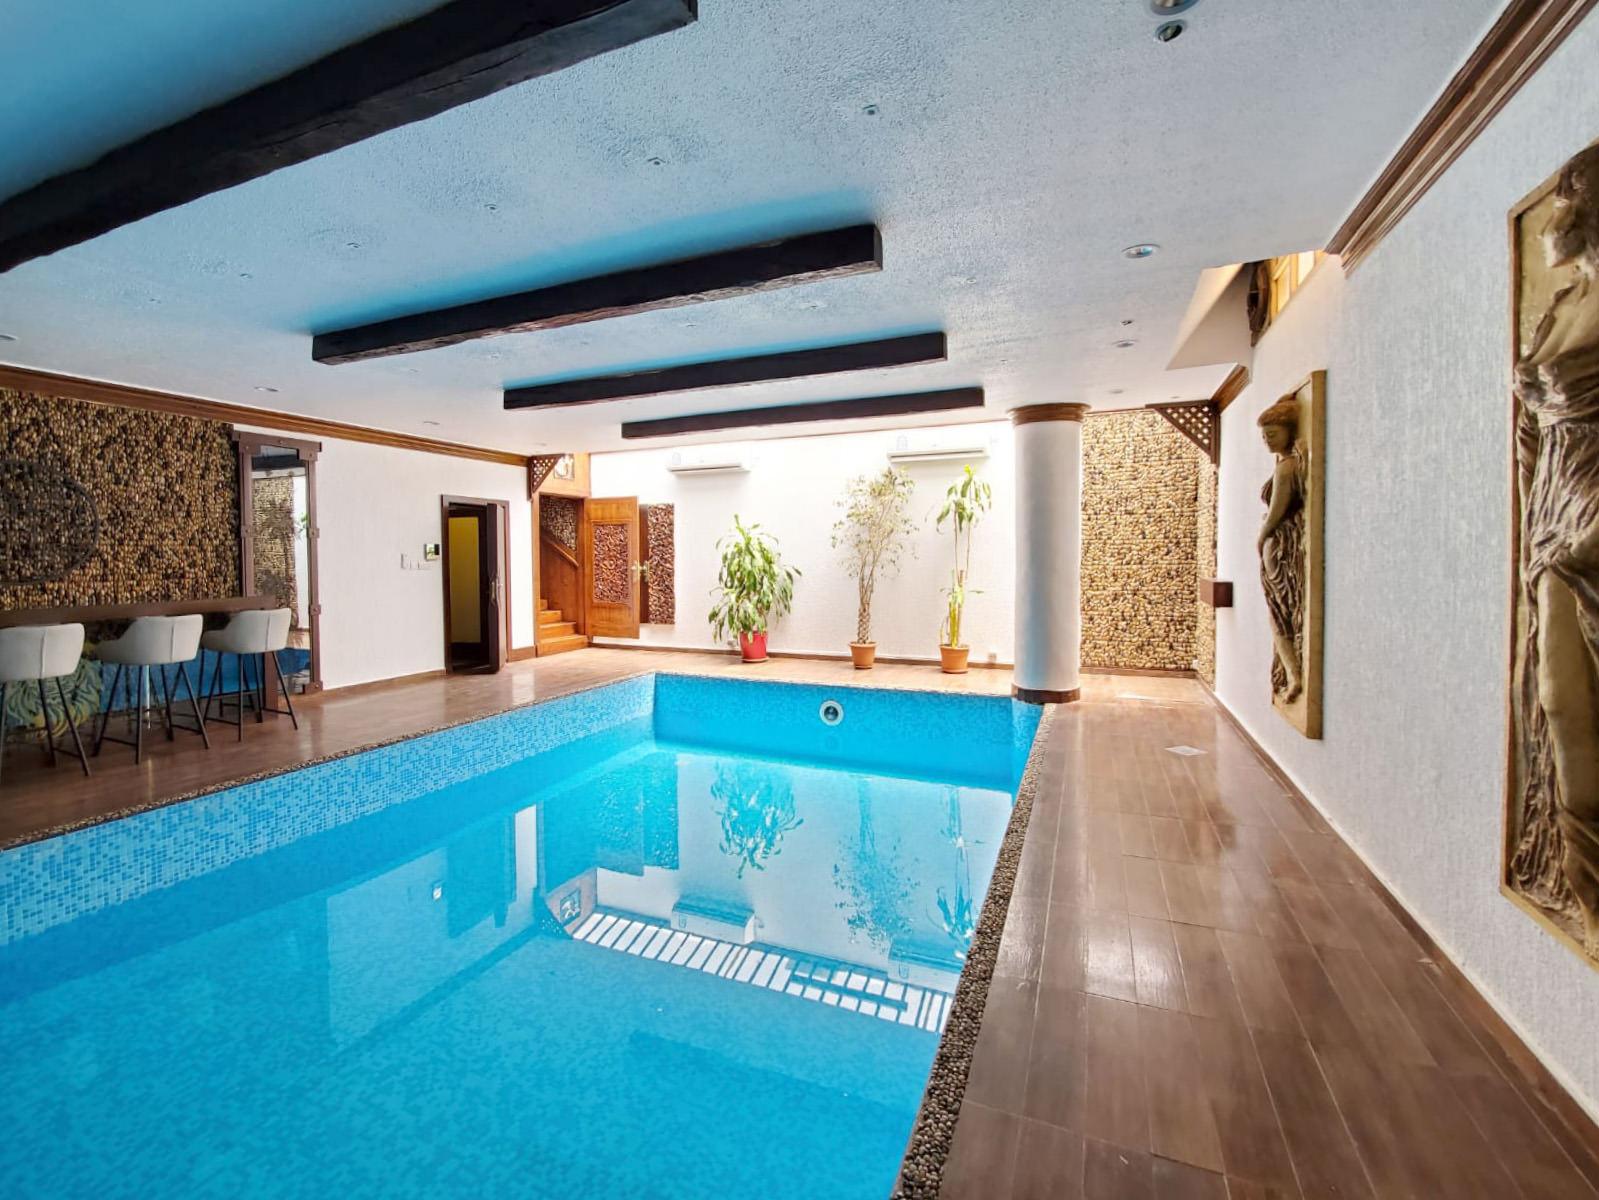 Salwa – unfurnished basement floor w/private pool